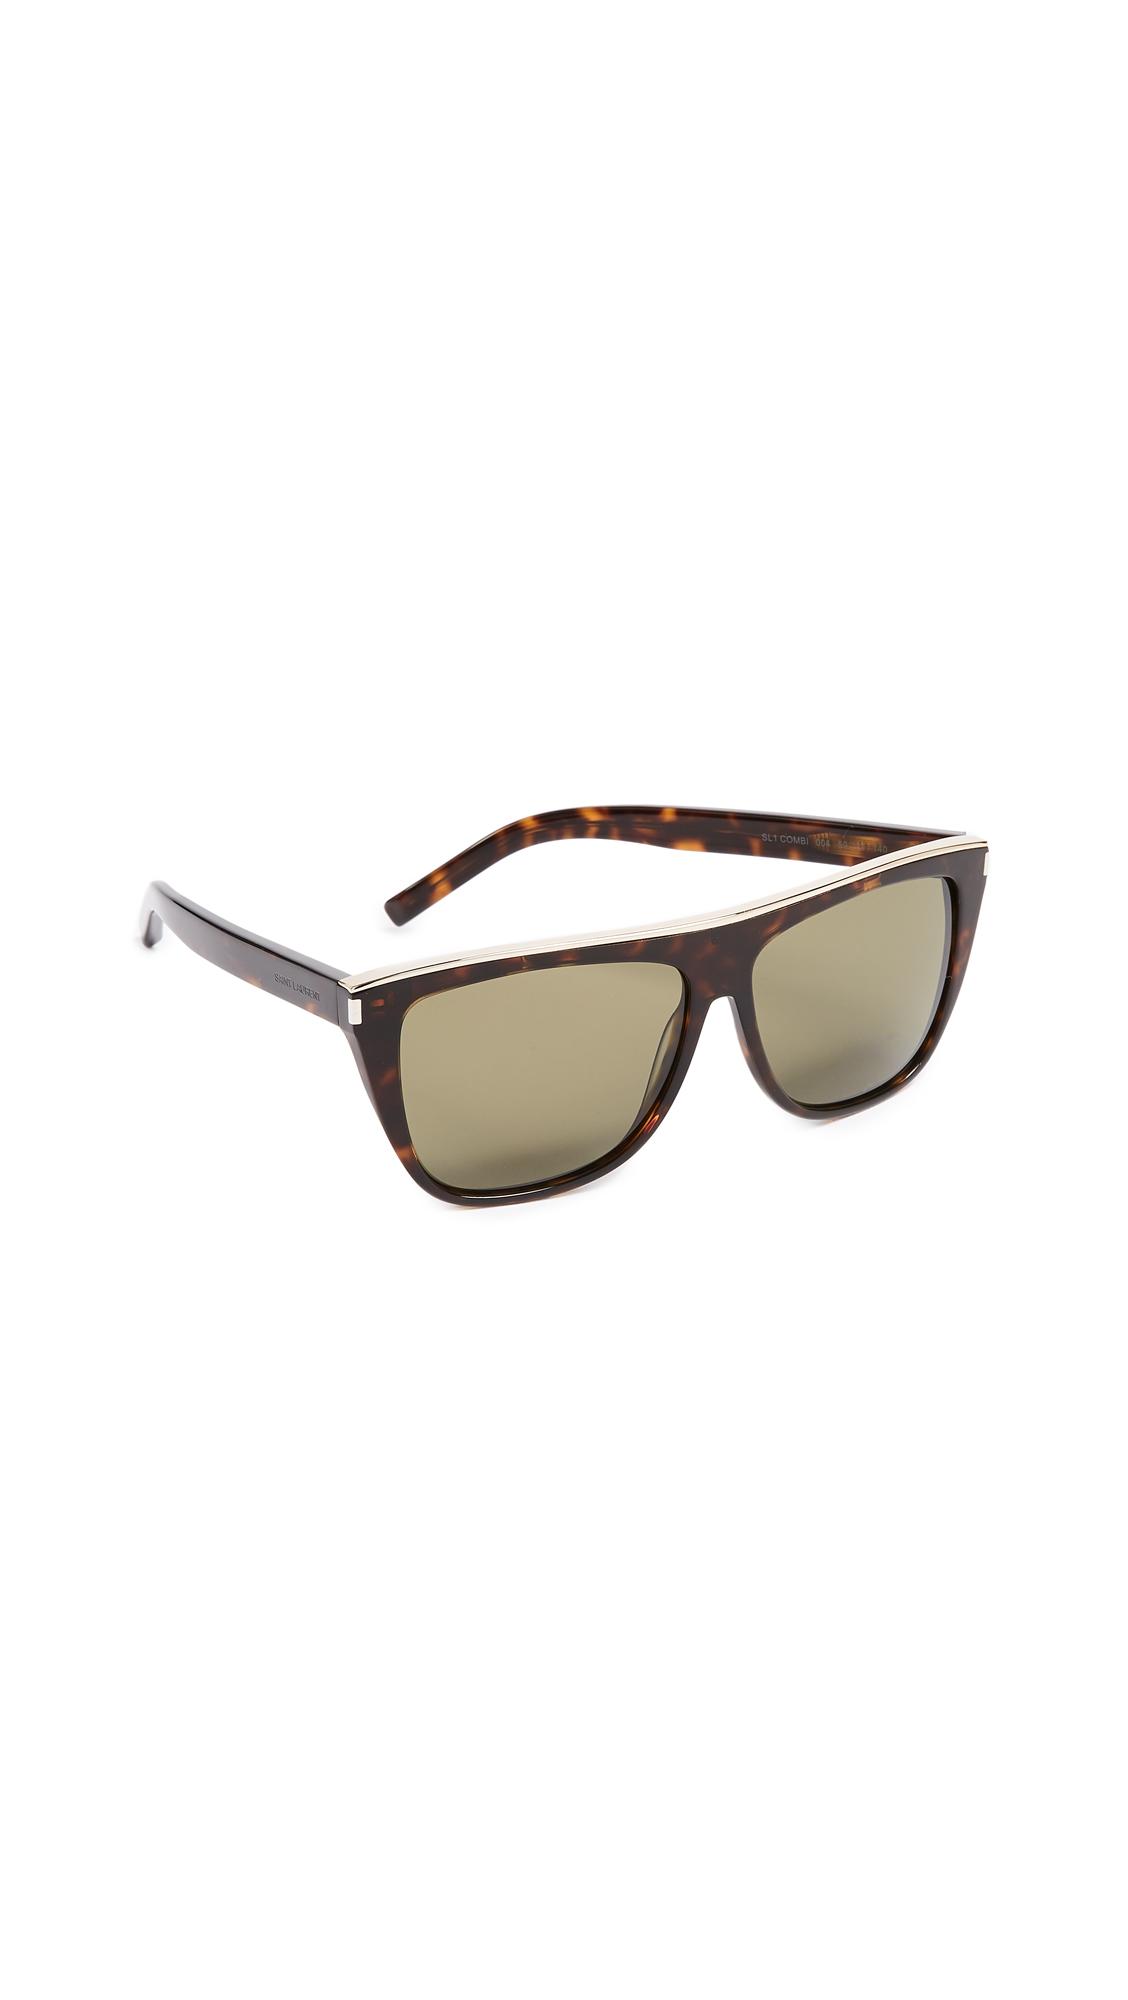 Saint Laurent SL 1 Mineral Glass Combi Sunglasses In Dark Havana Gold/Green